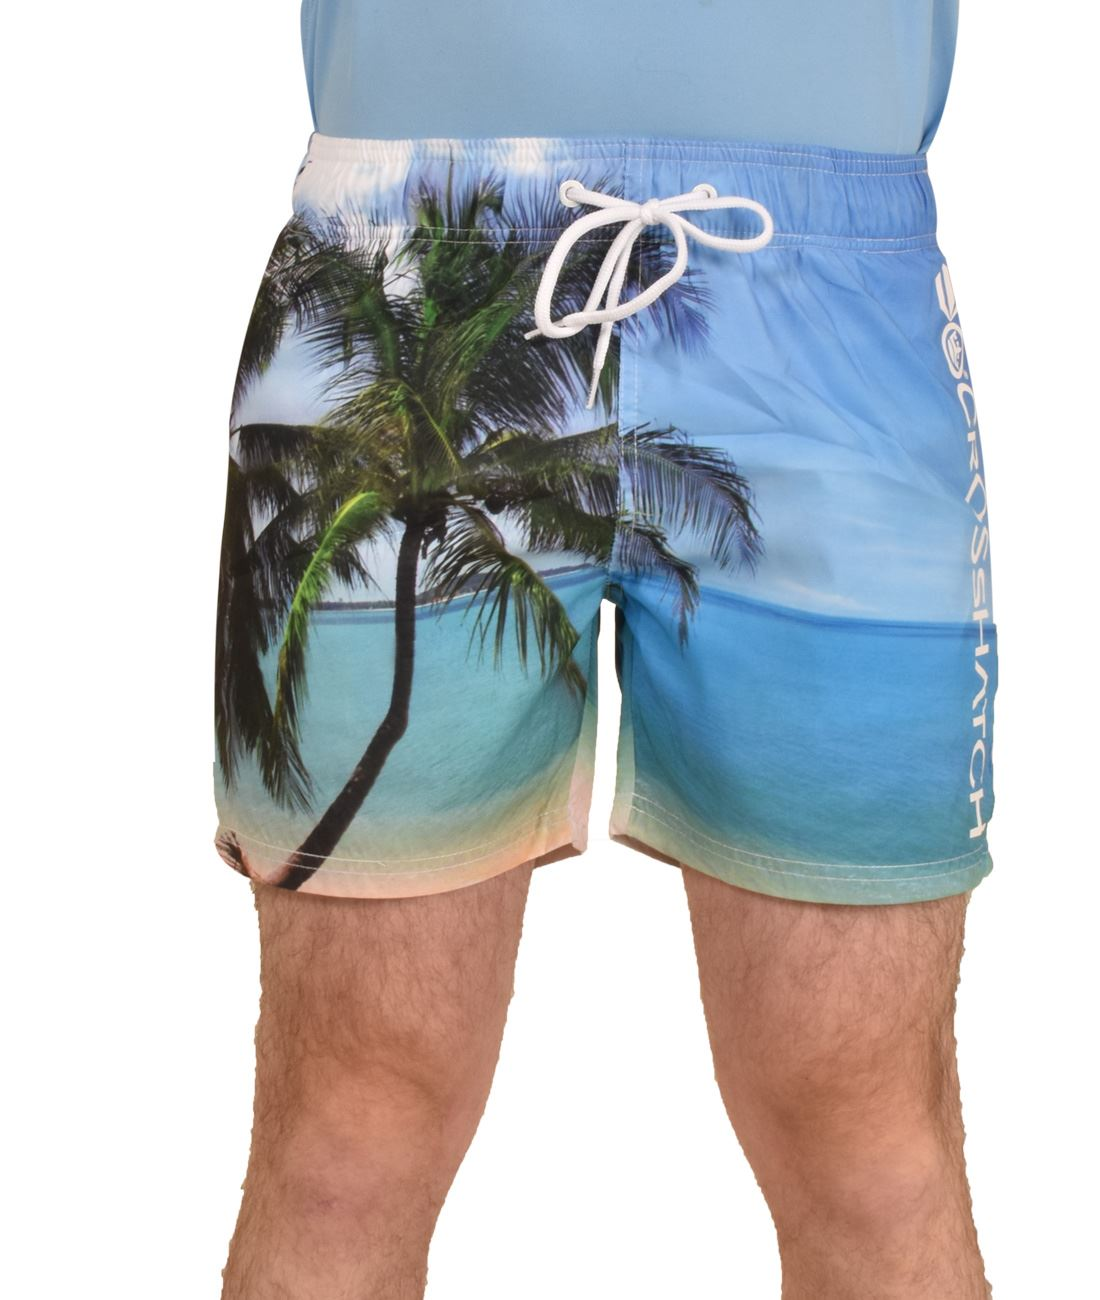 Crosshatch-Hawaiin-Sun-Set-Mens-Holiday-Swim-Shorts-Summer-Beach-Trunks-S-2XL thumbnail 7